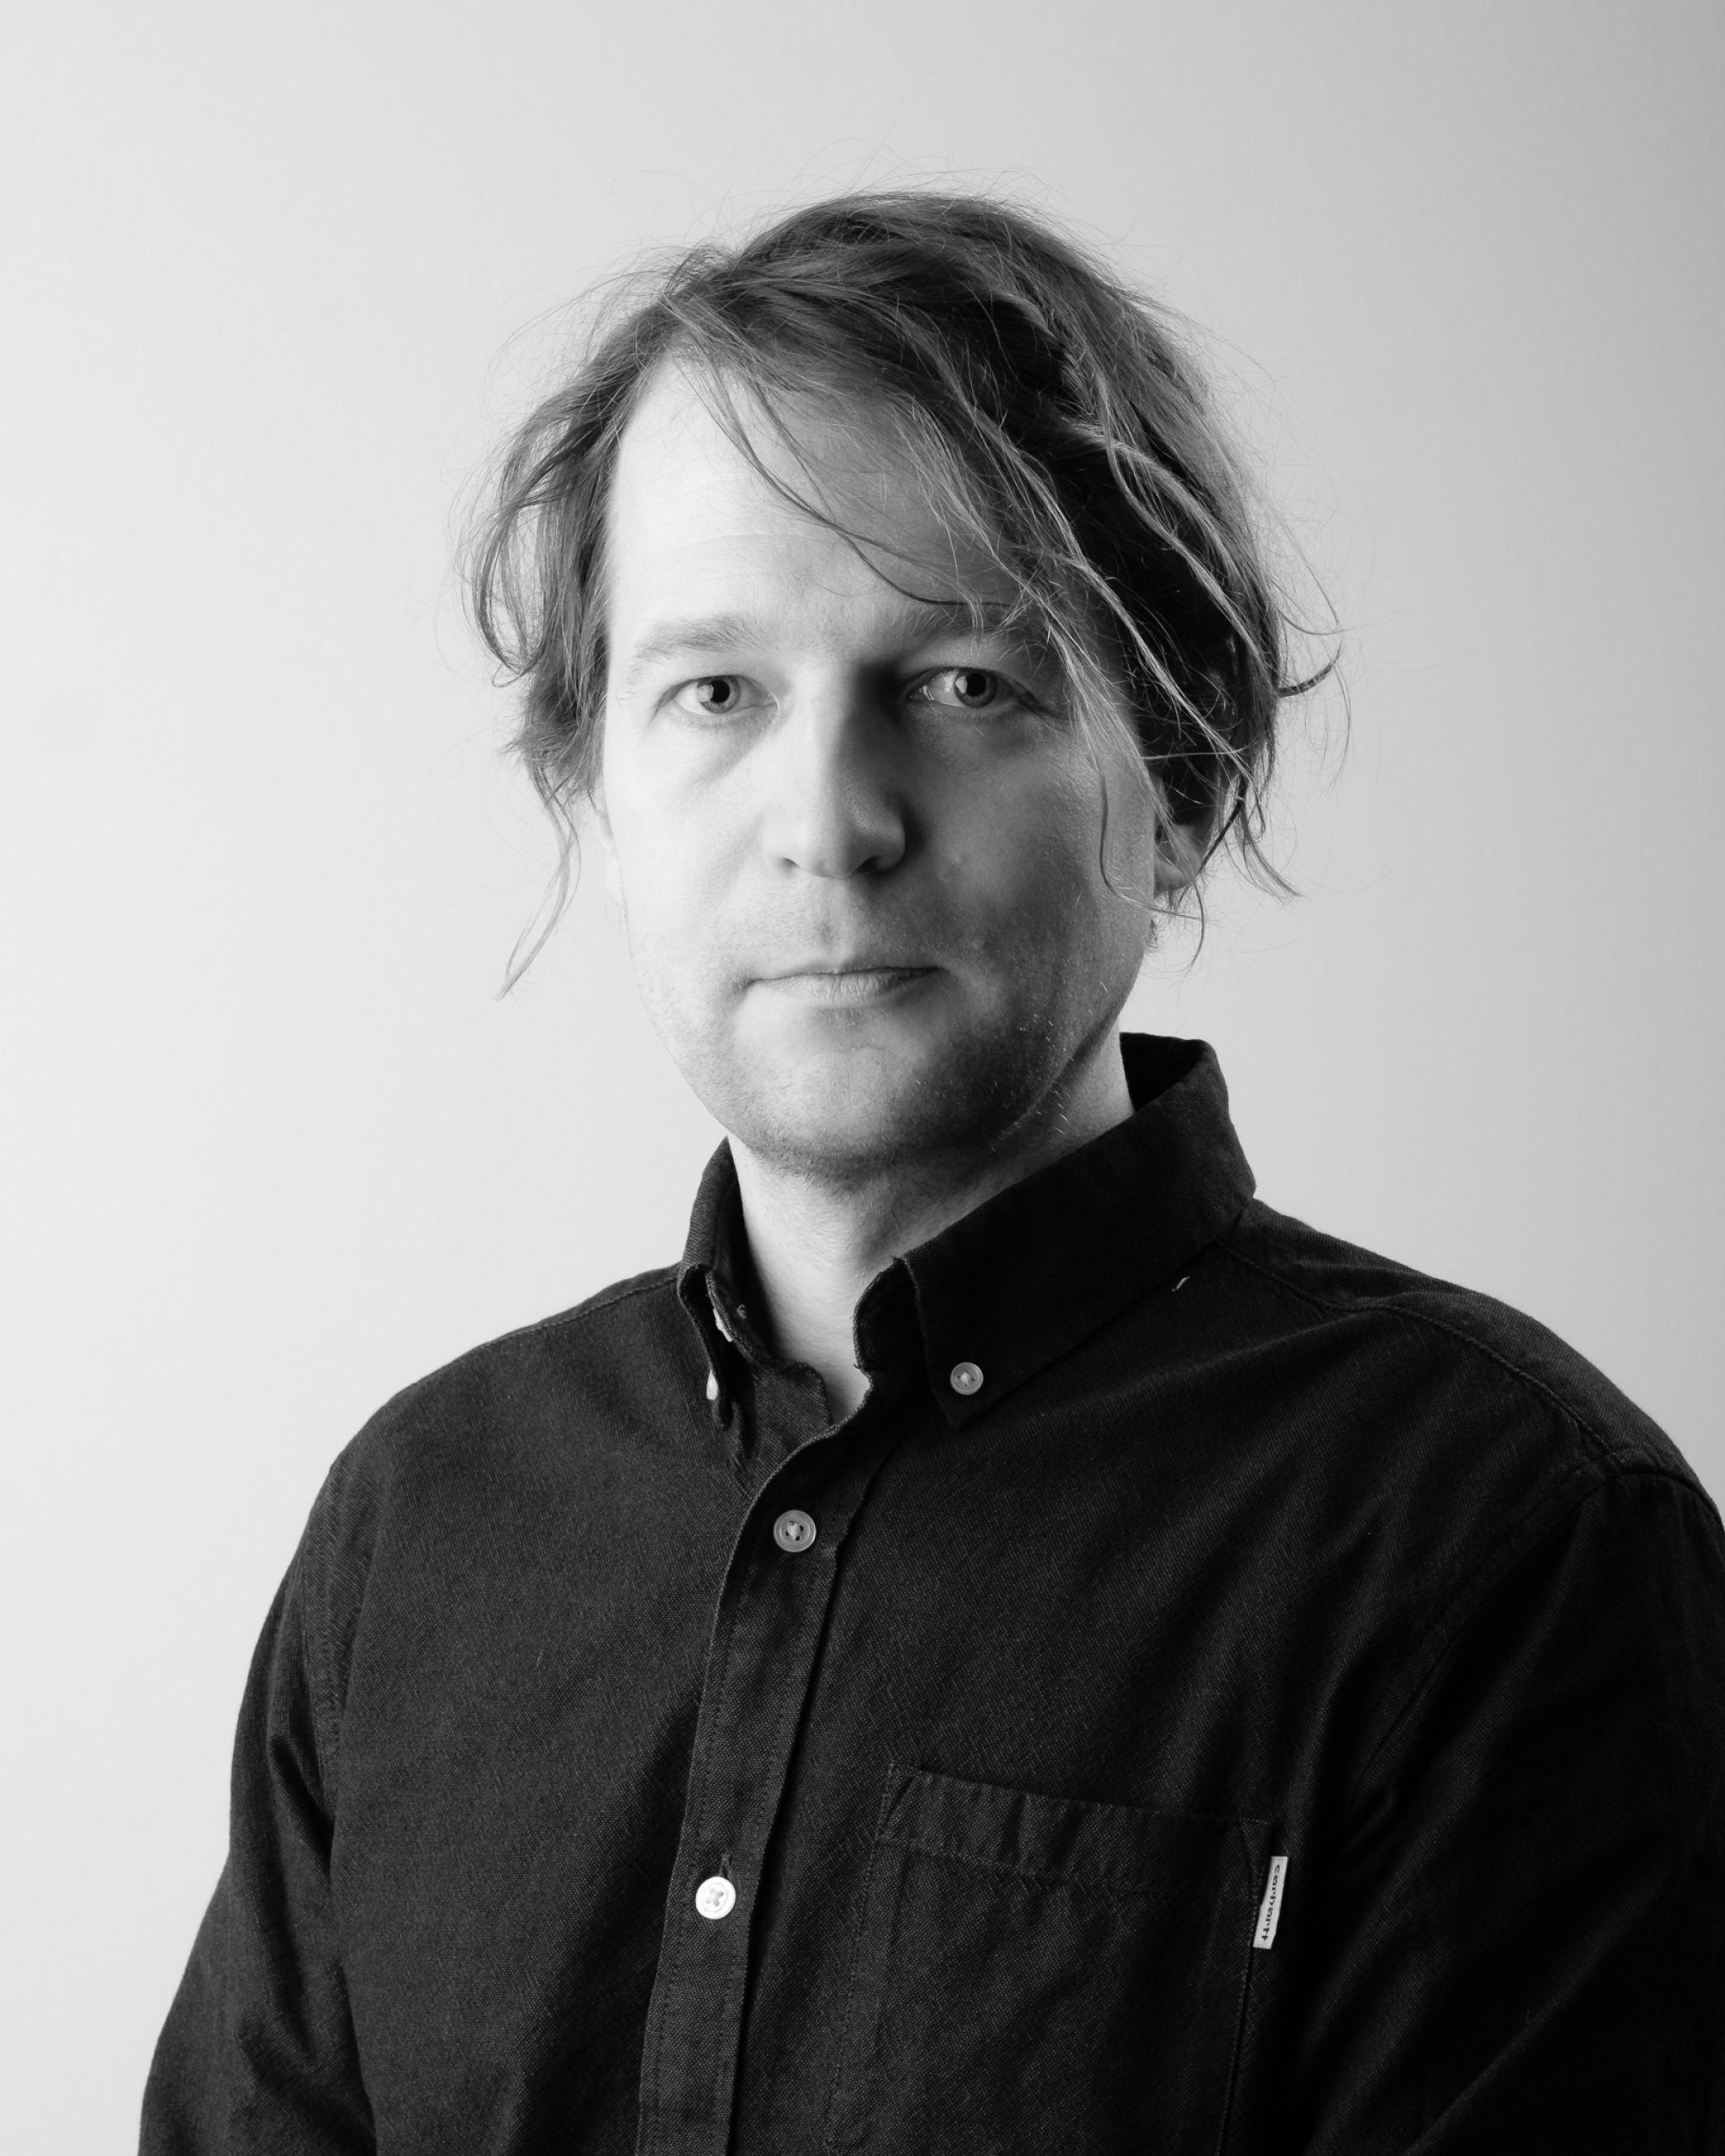 Sami Kytökorpi